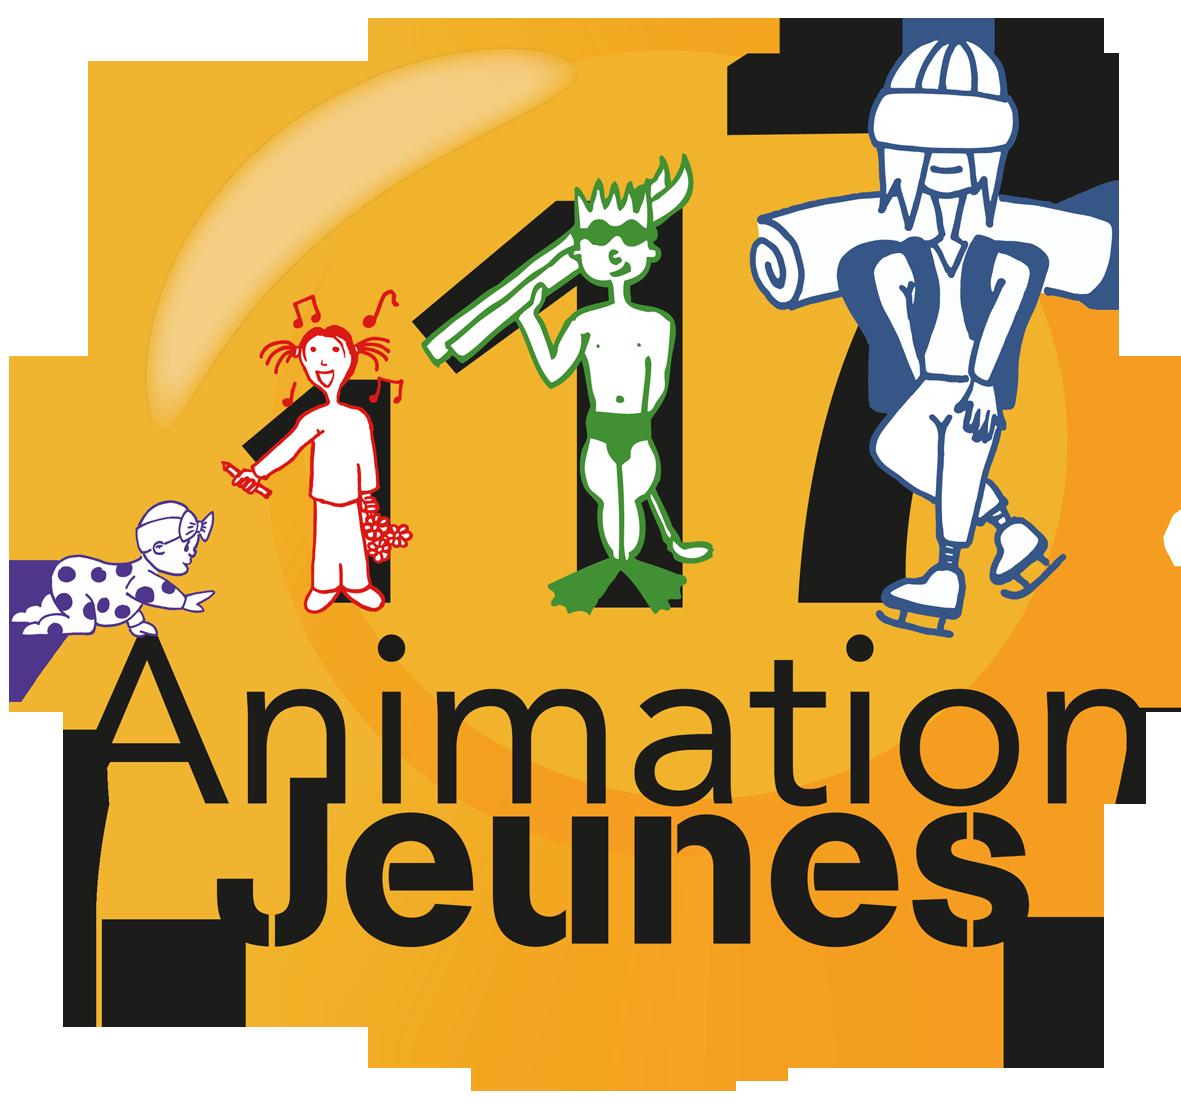 117 animation jeunes